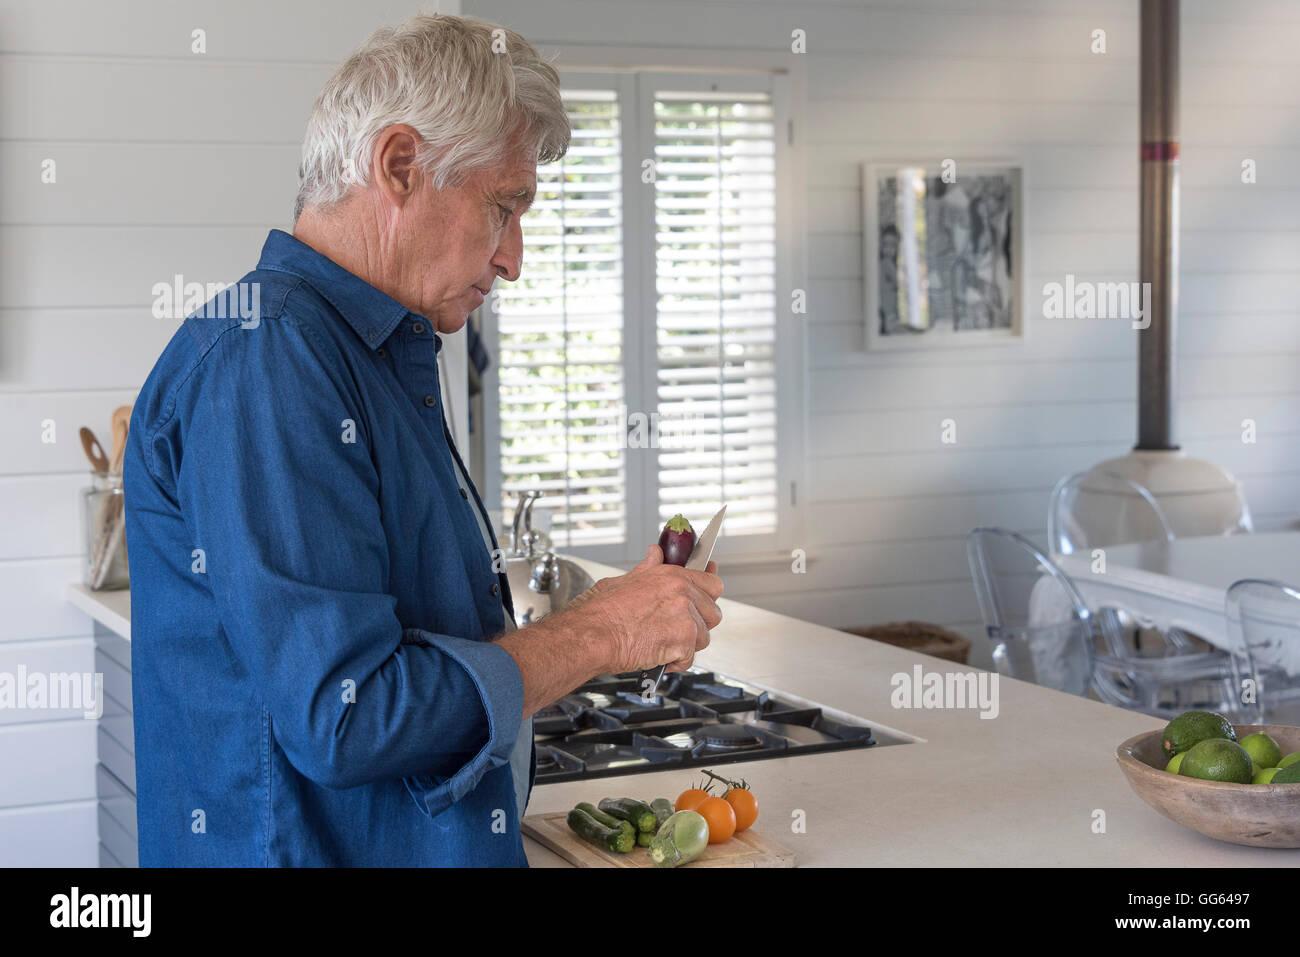 Senior man preparing vegetables in kitchen - Stock Image